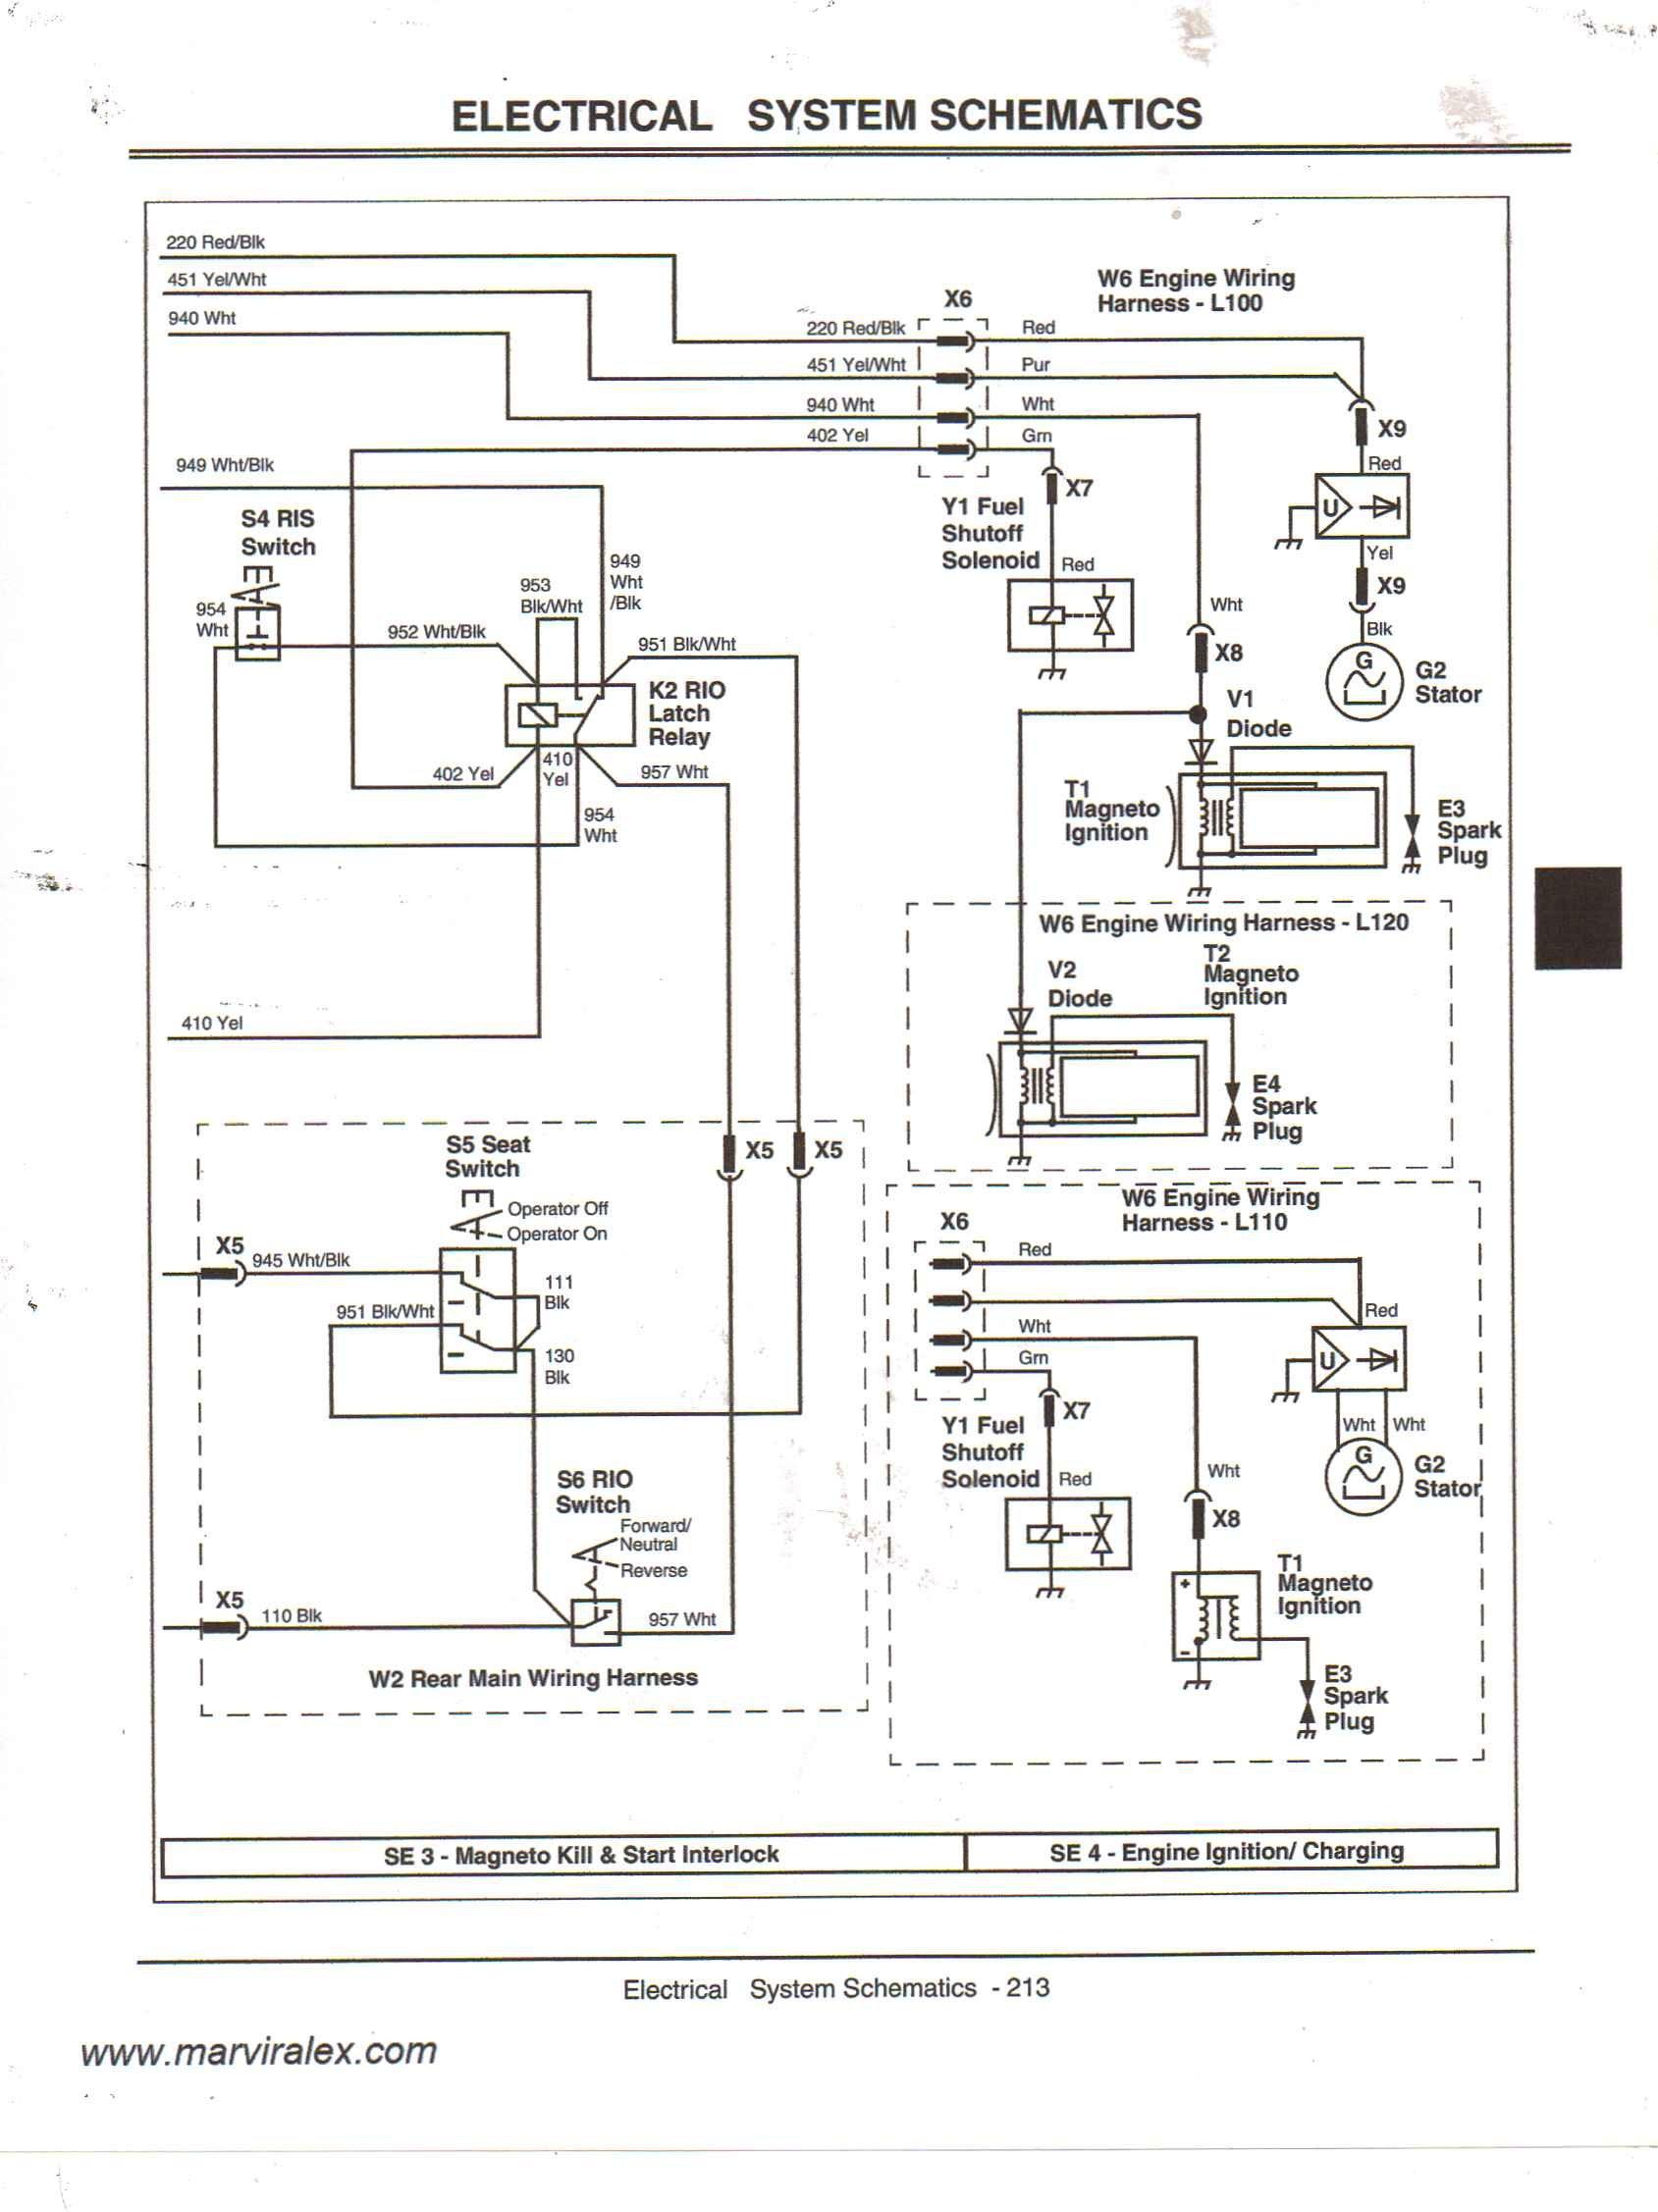 John Deere Gator Starter Wiring Diagram : deere, gator, starter, wiring, diagram, Deere, Gator, Kawasaki, Engine, Wiring, Diagram